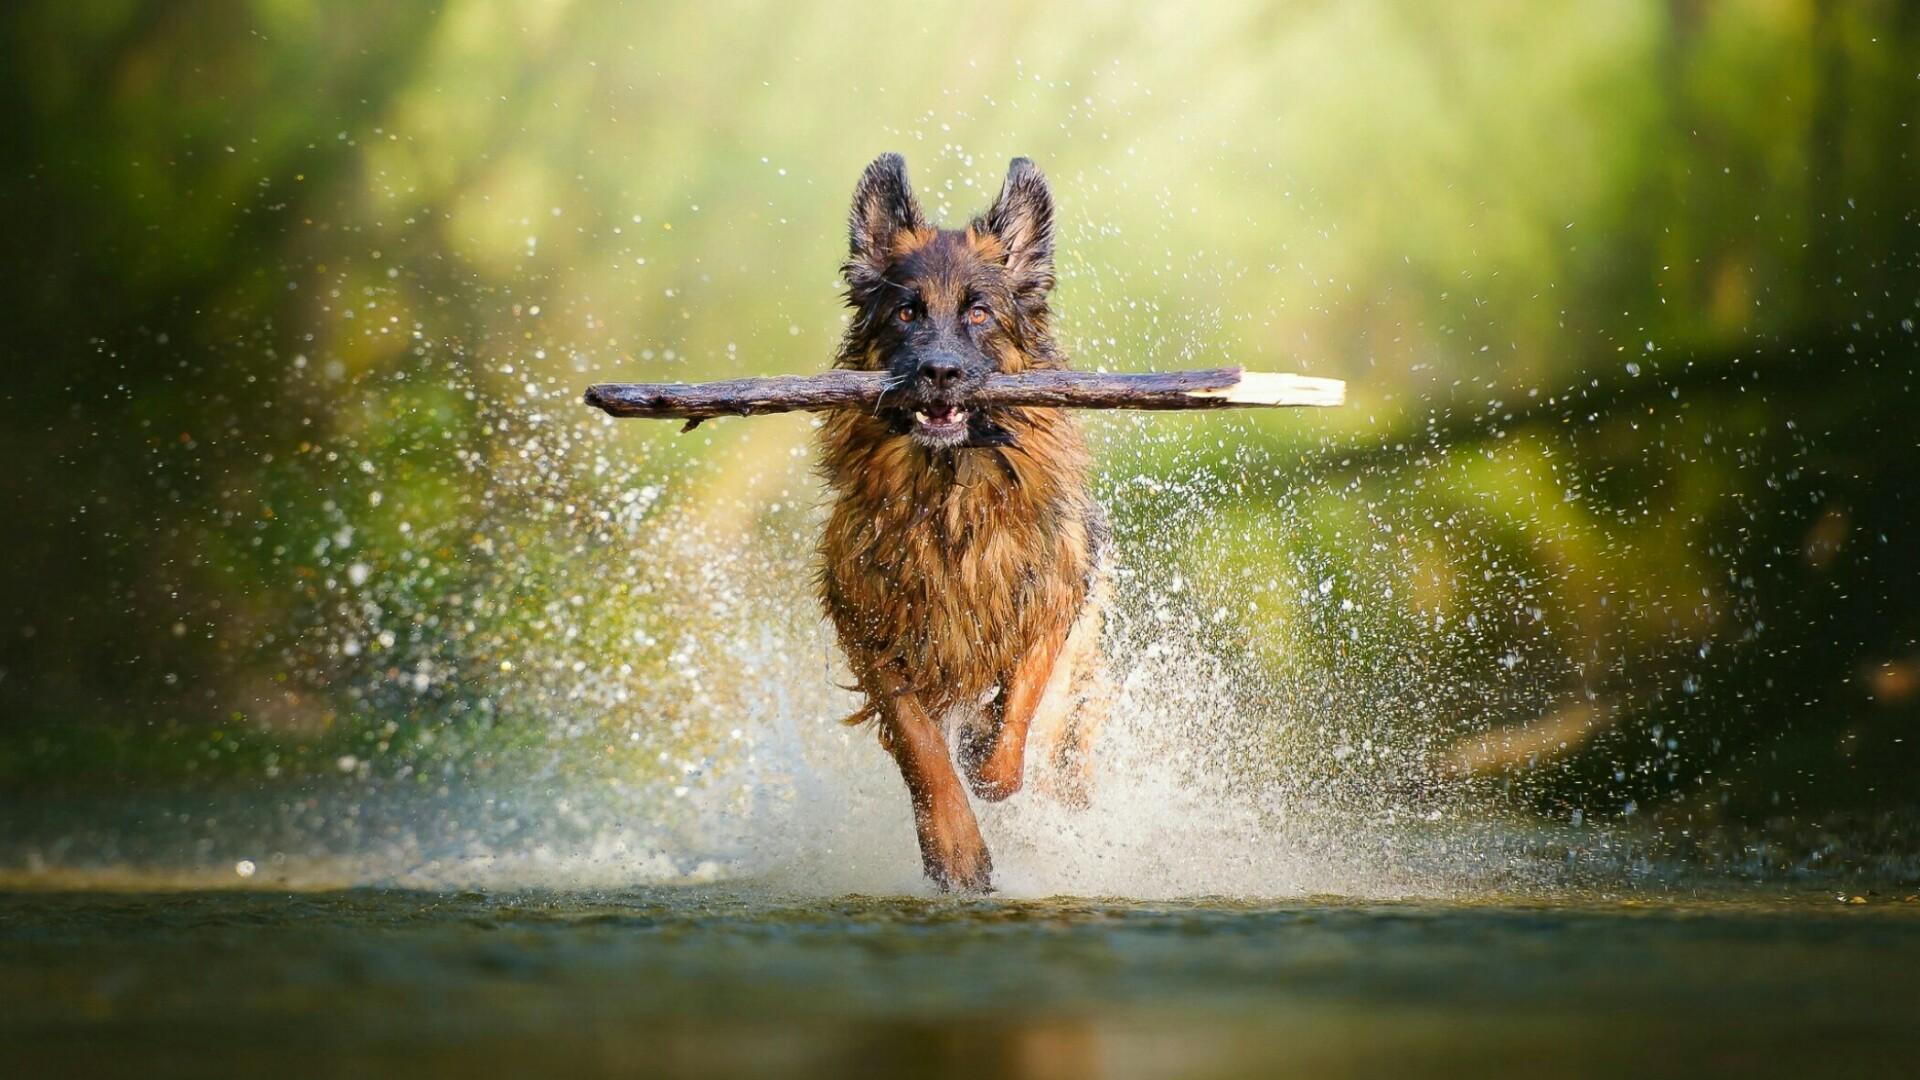 German Shepherd dog apport training wallpaper